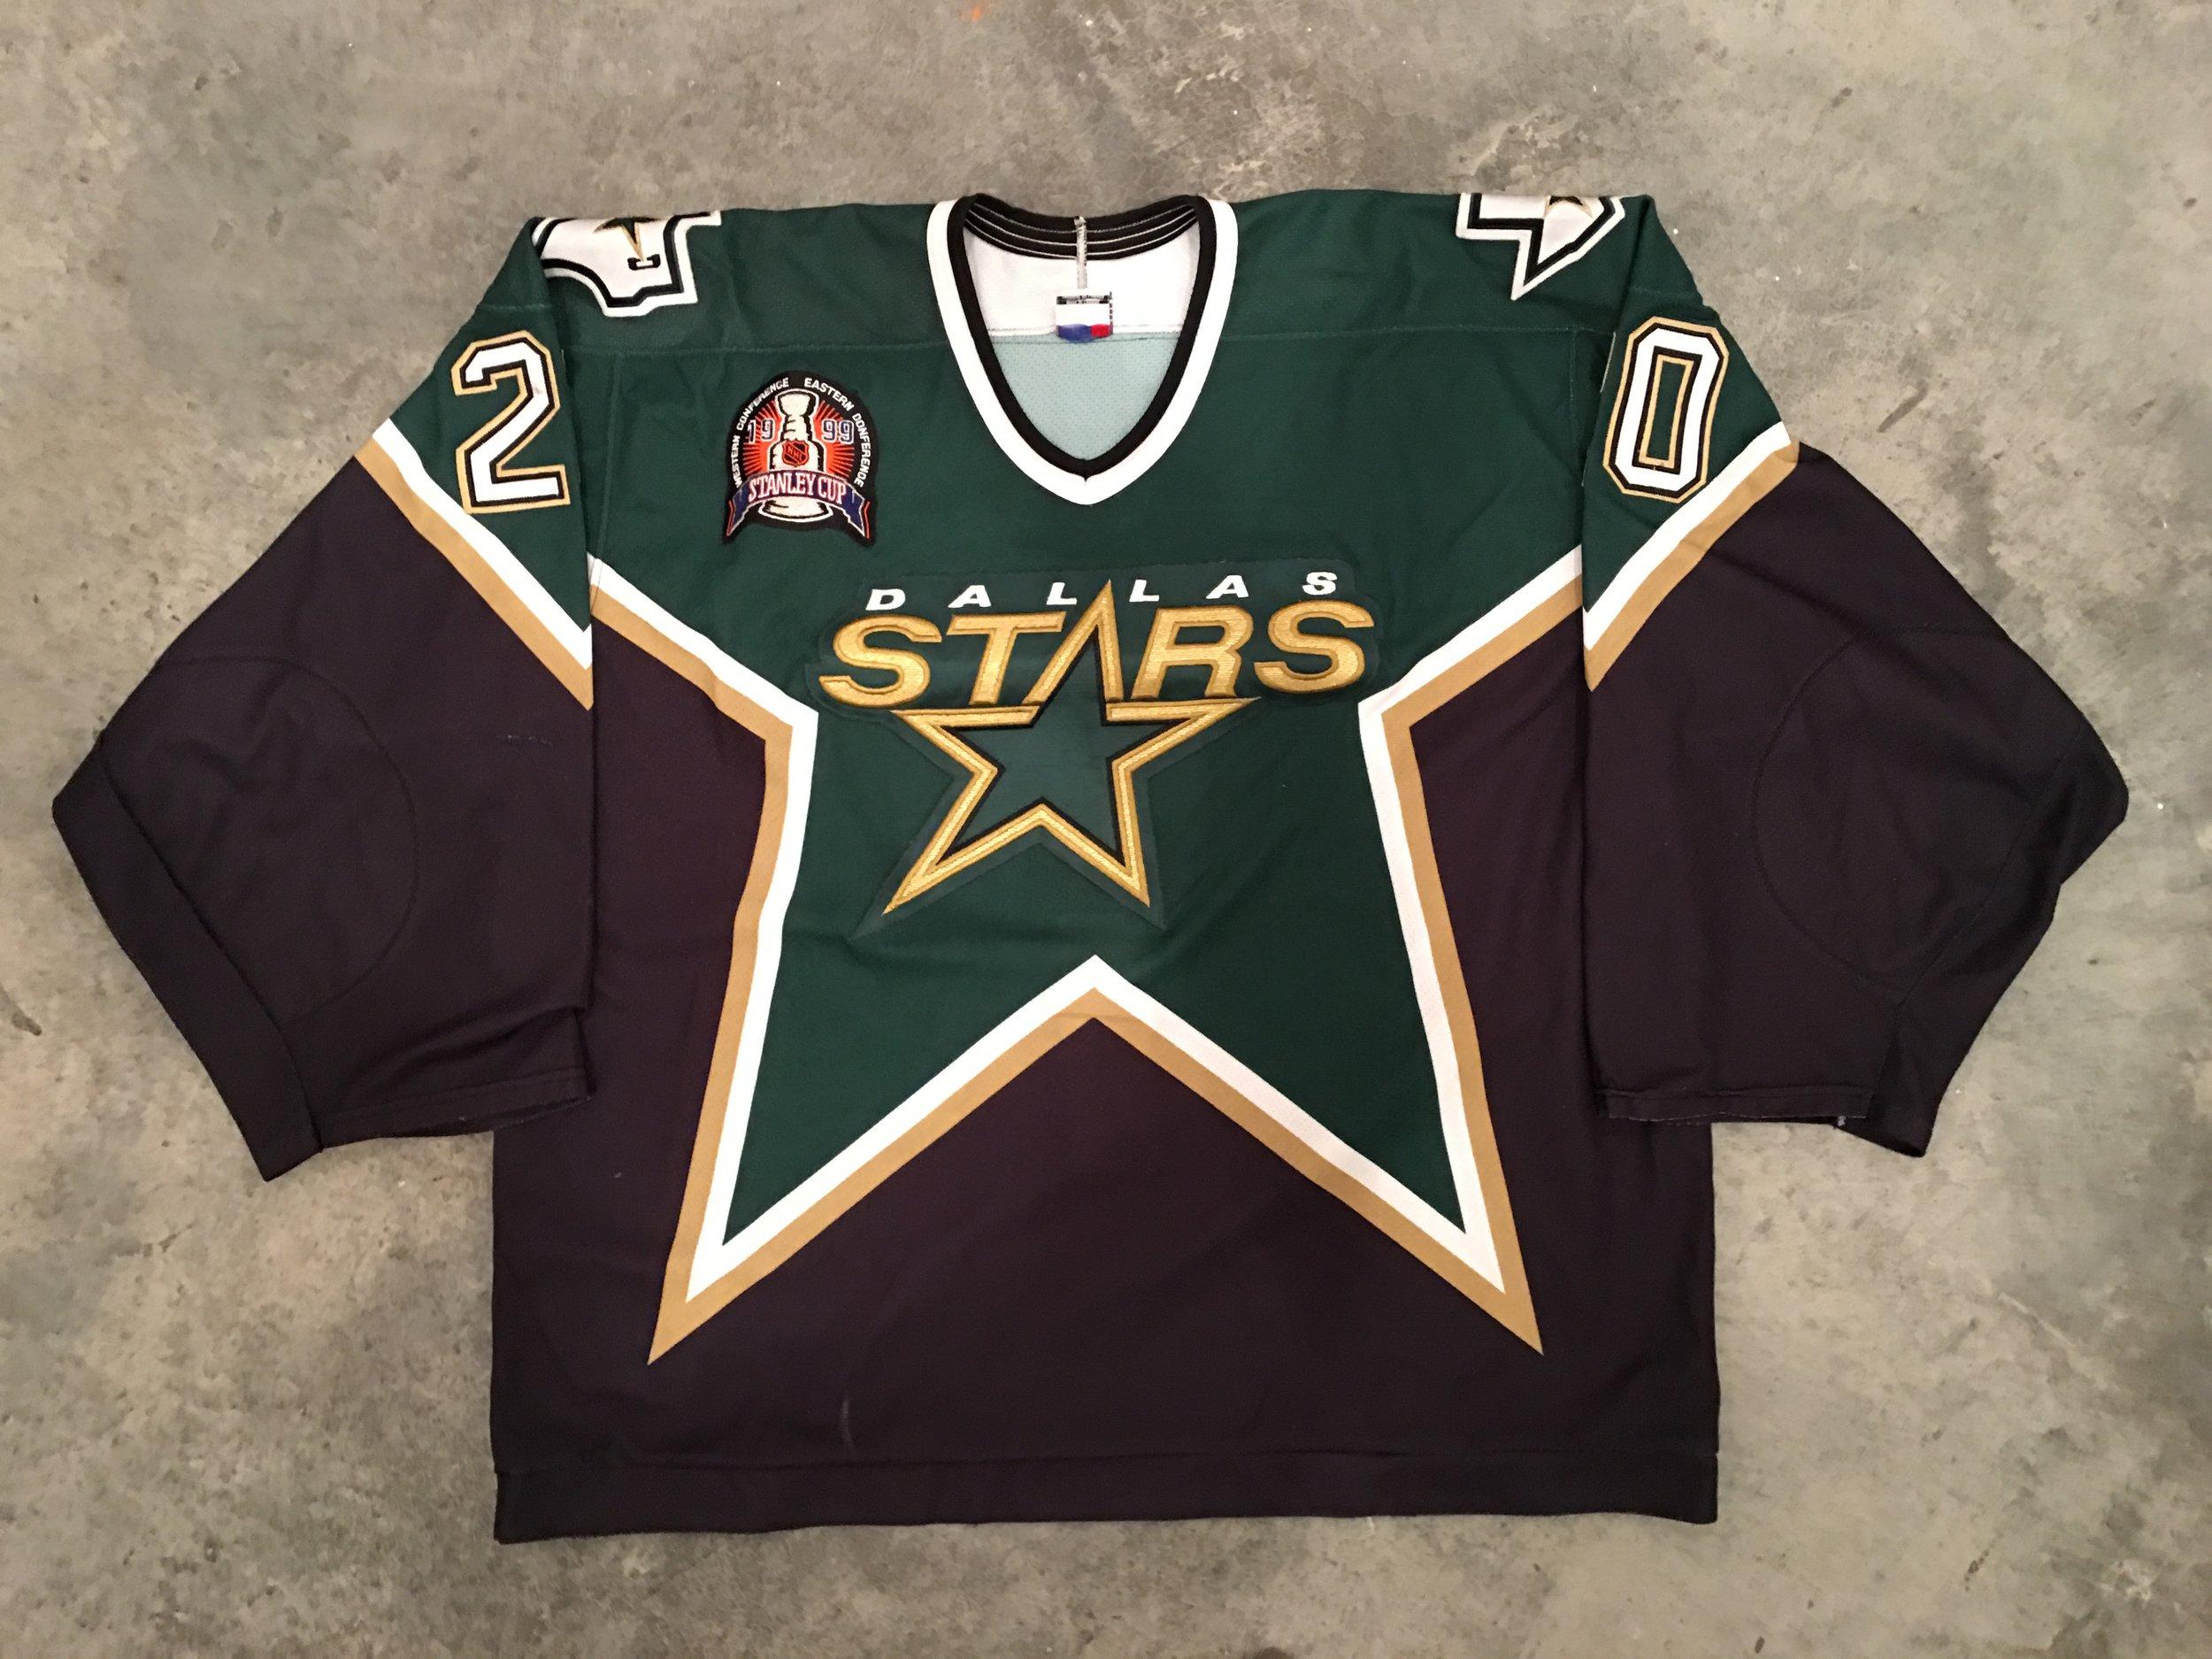 Ed Belfour Dallas Stars Game Worn Jersey - 1991 & 1993 Vezina Winner